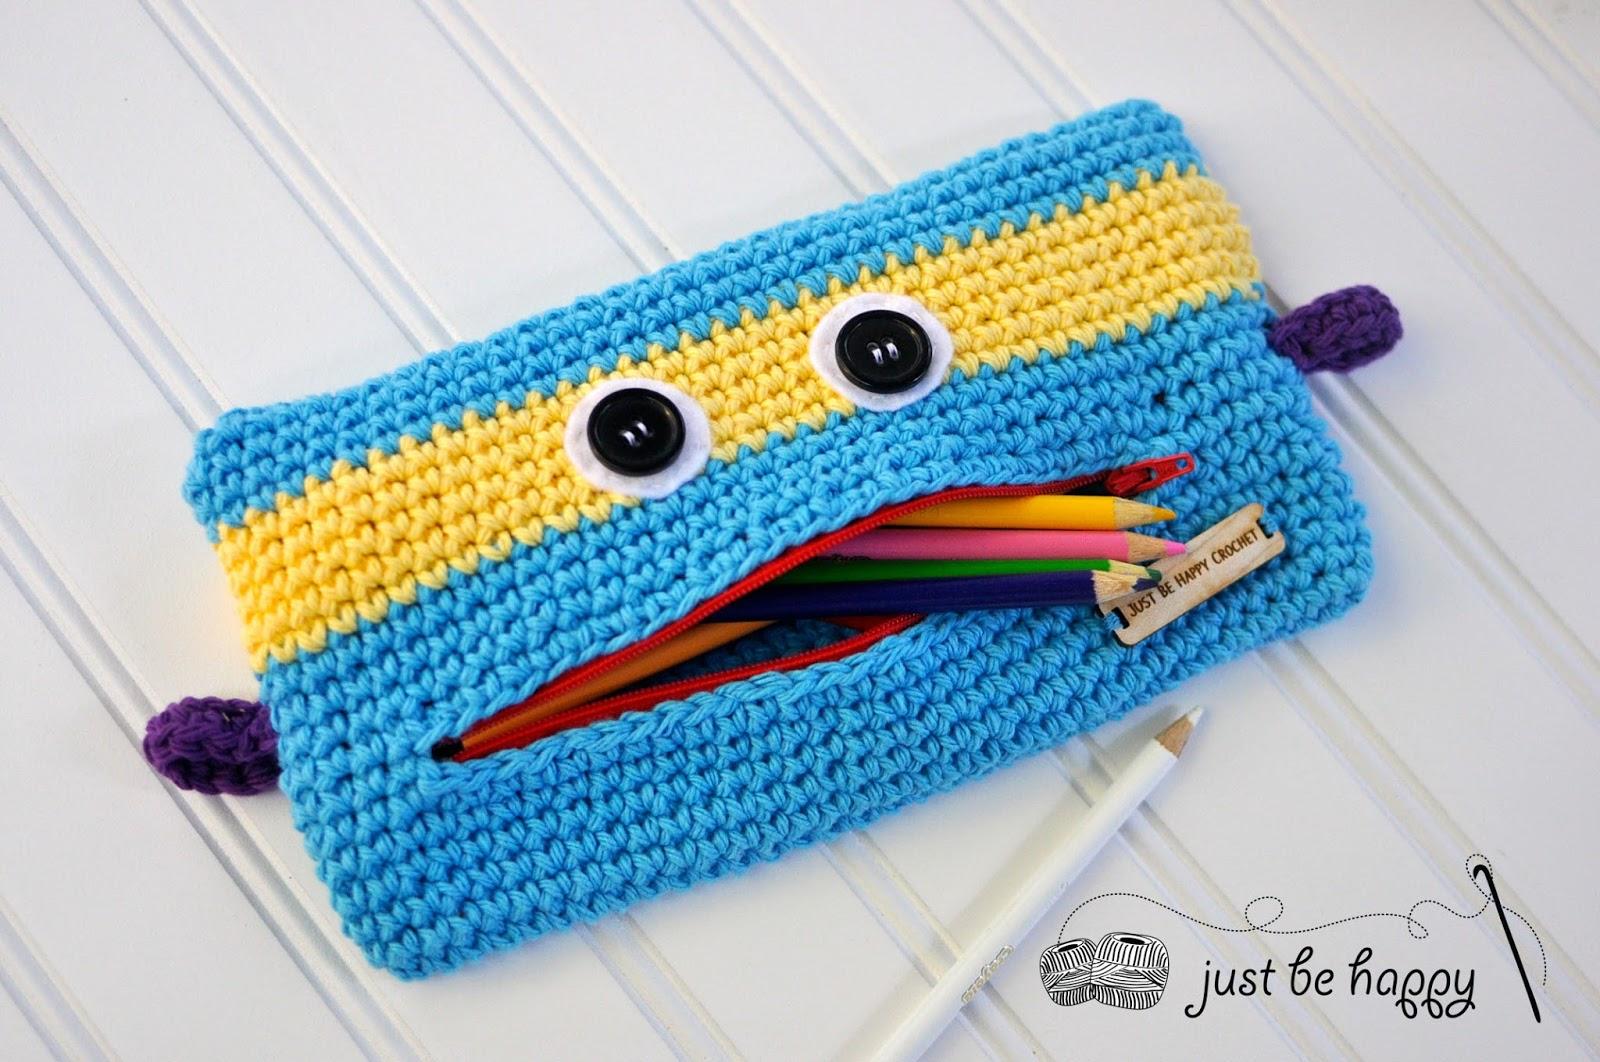 just be happy monster pencil case crochet pattern